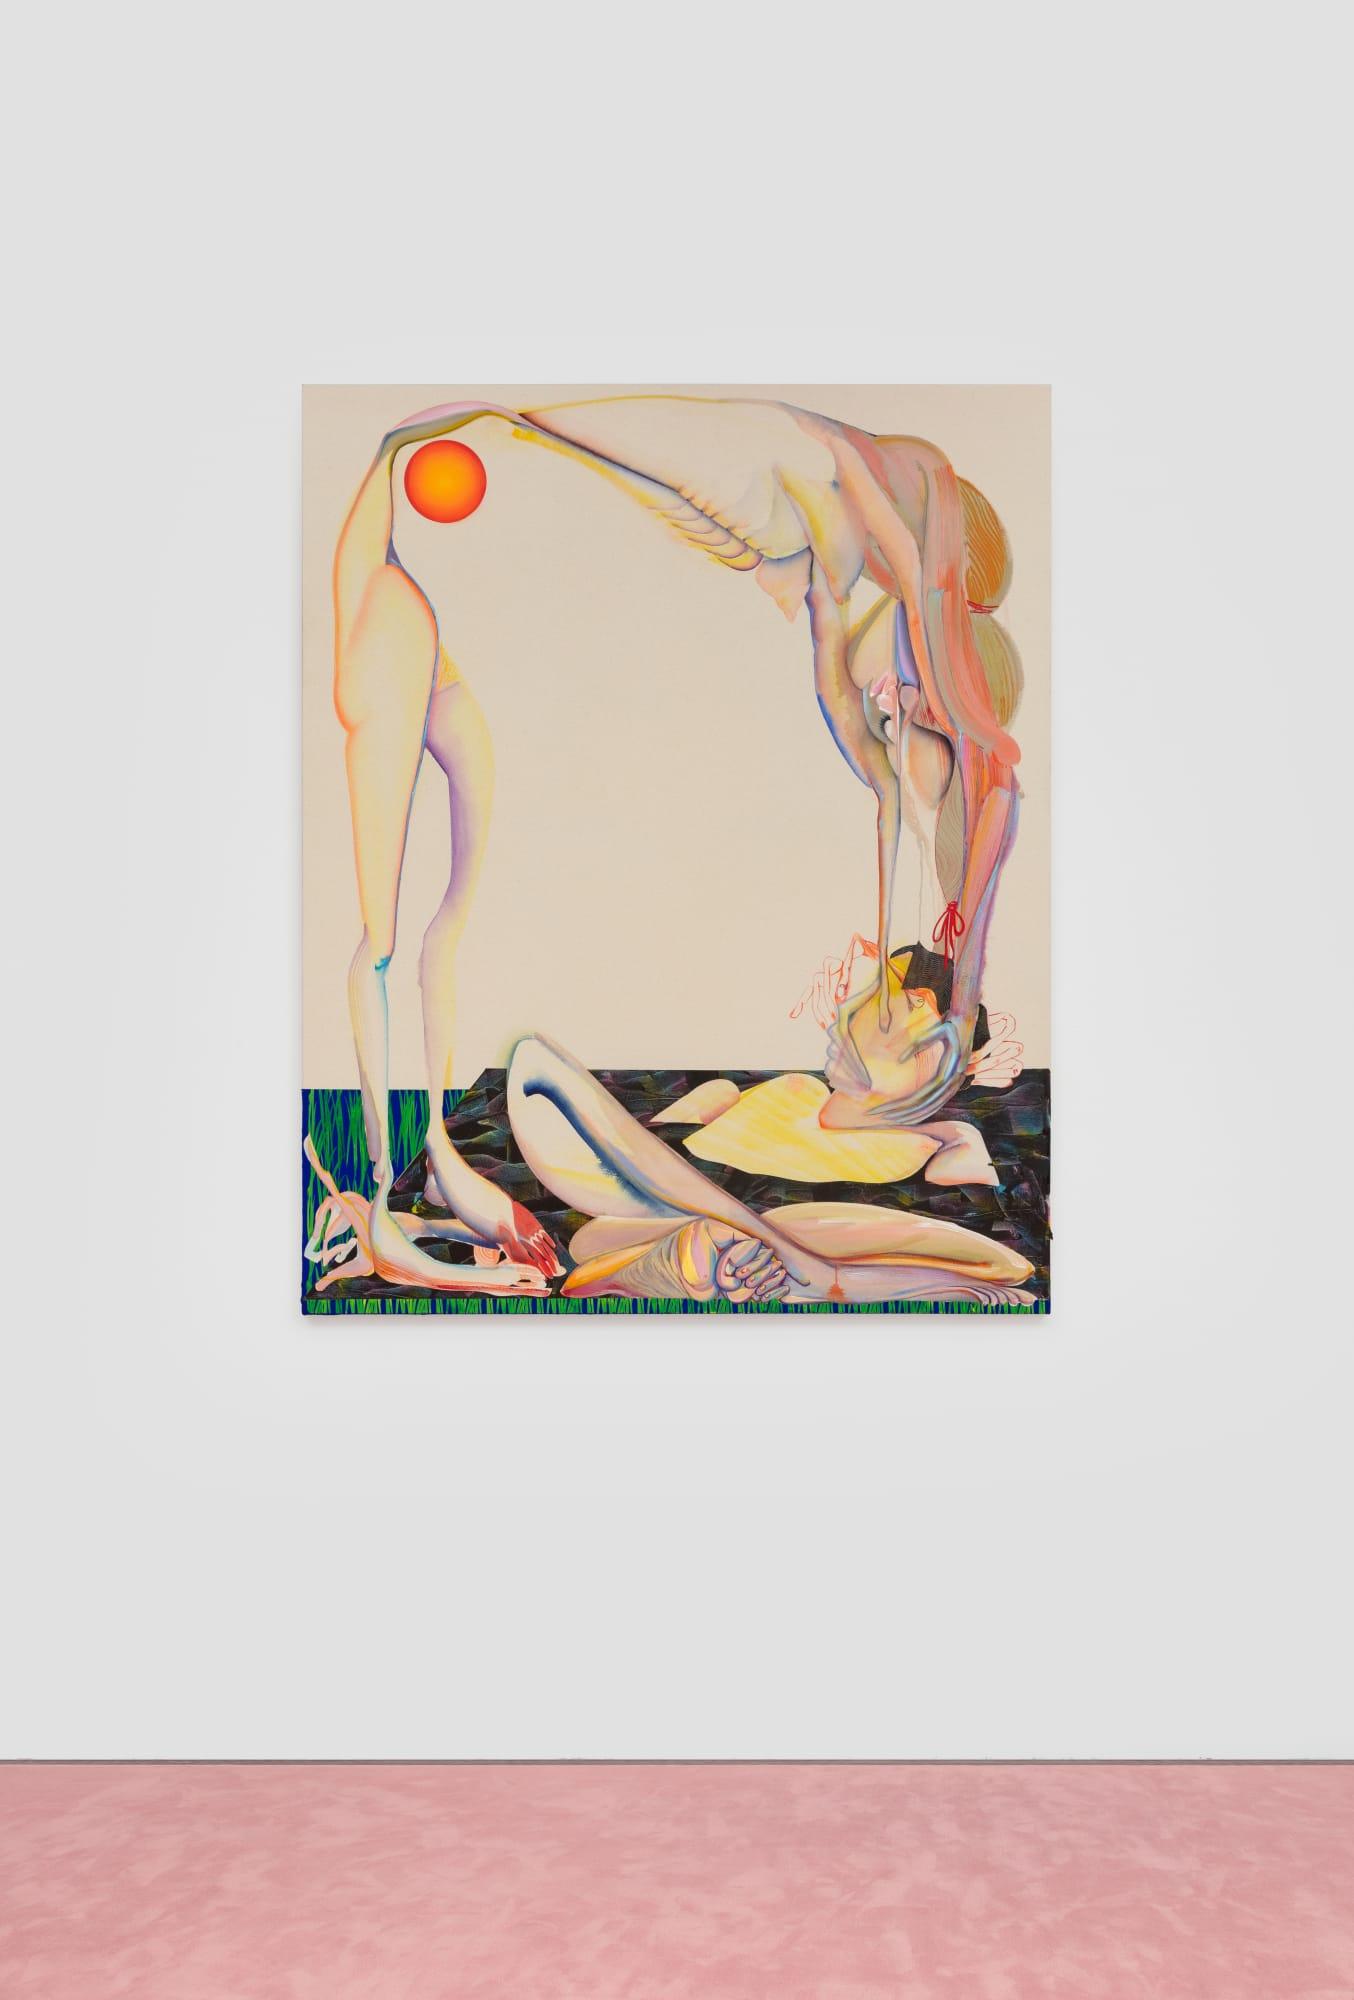 Christina Quarles Dance by tha Light of tha Moon